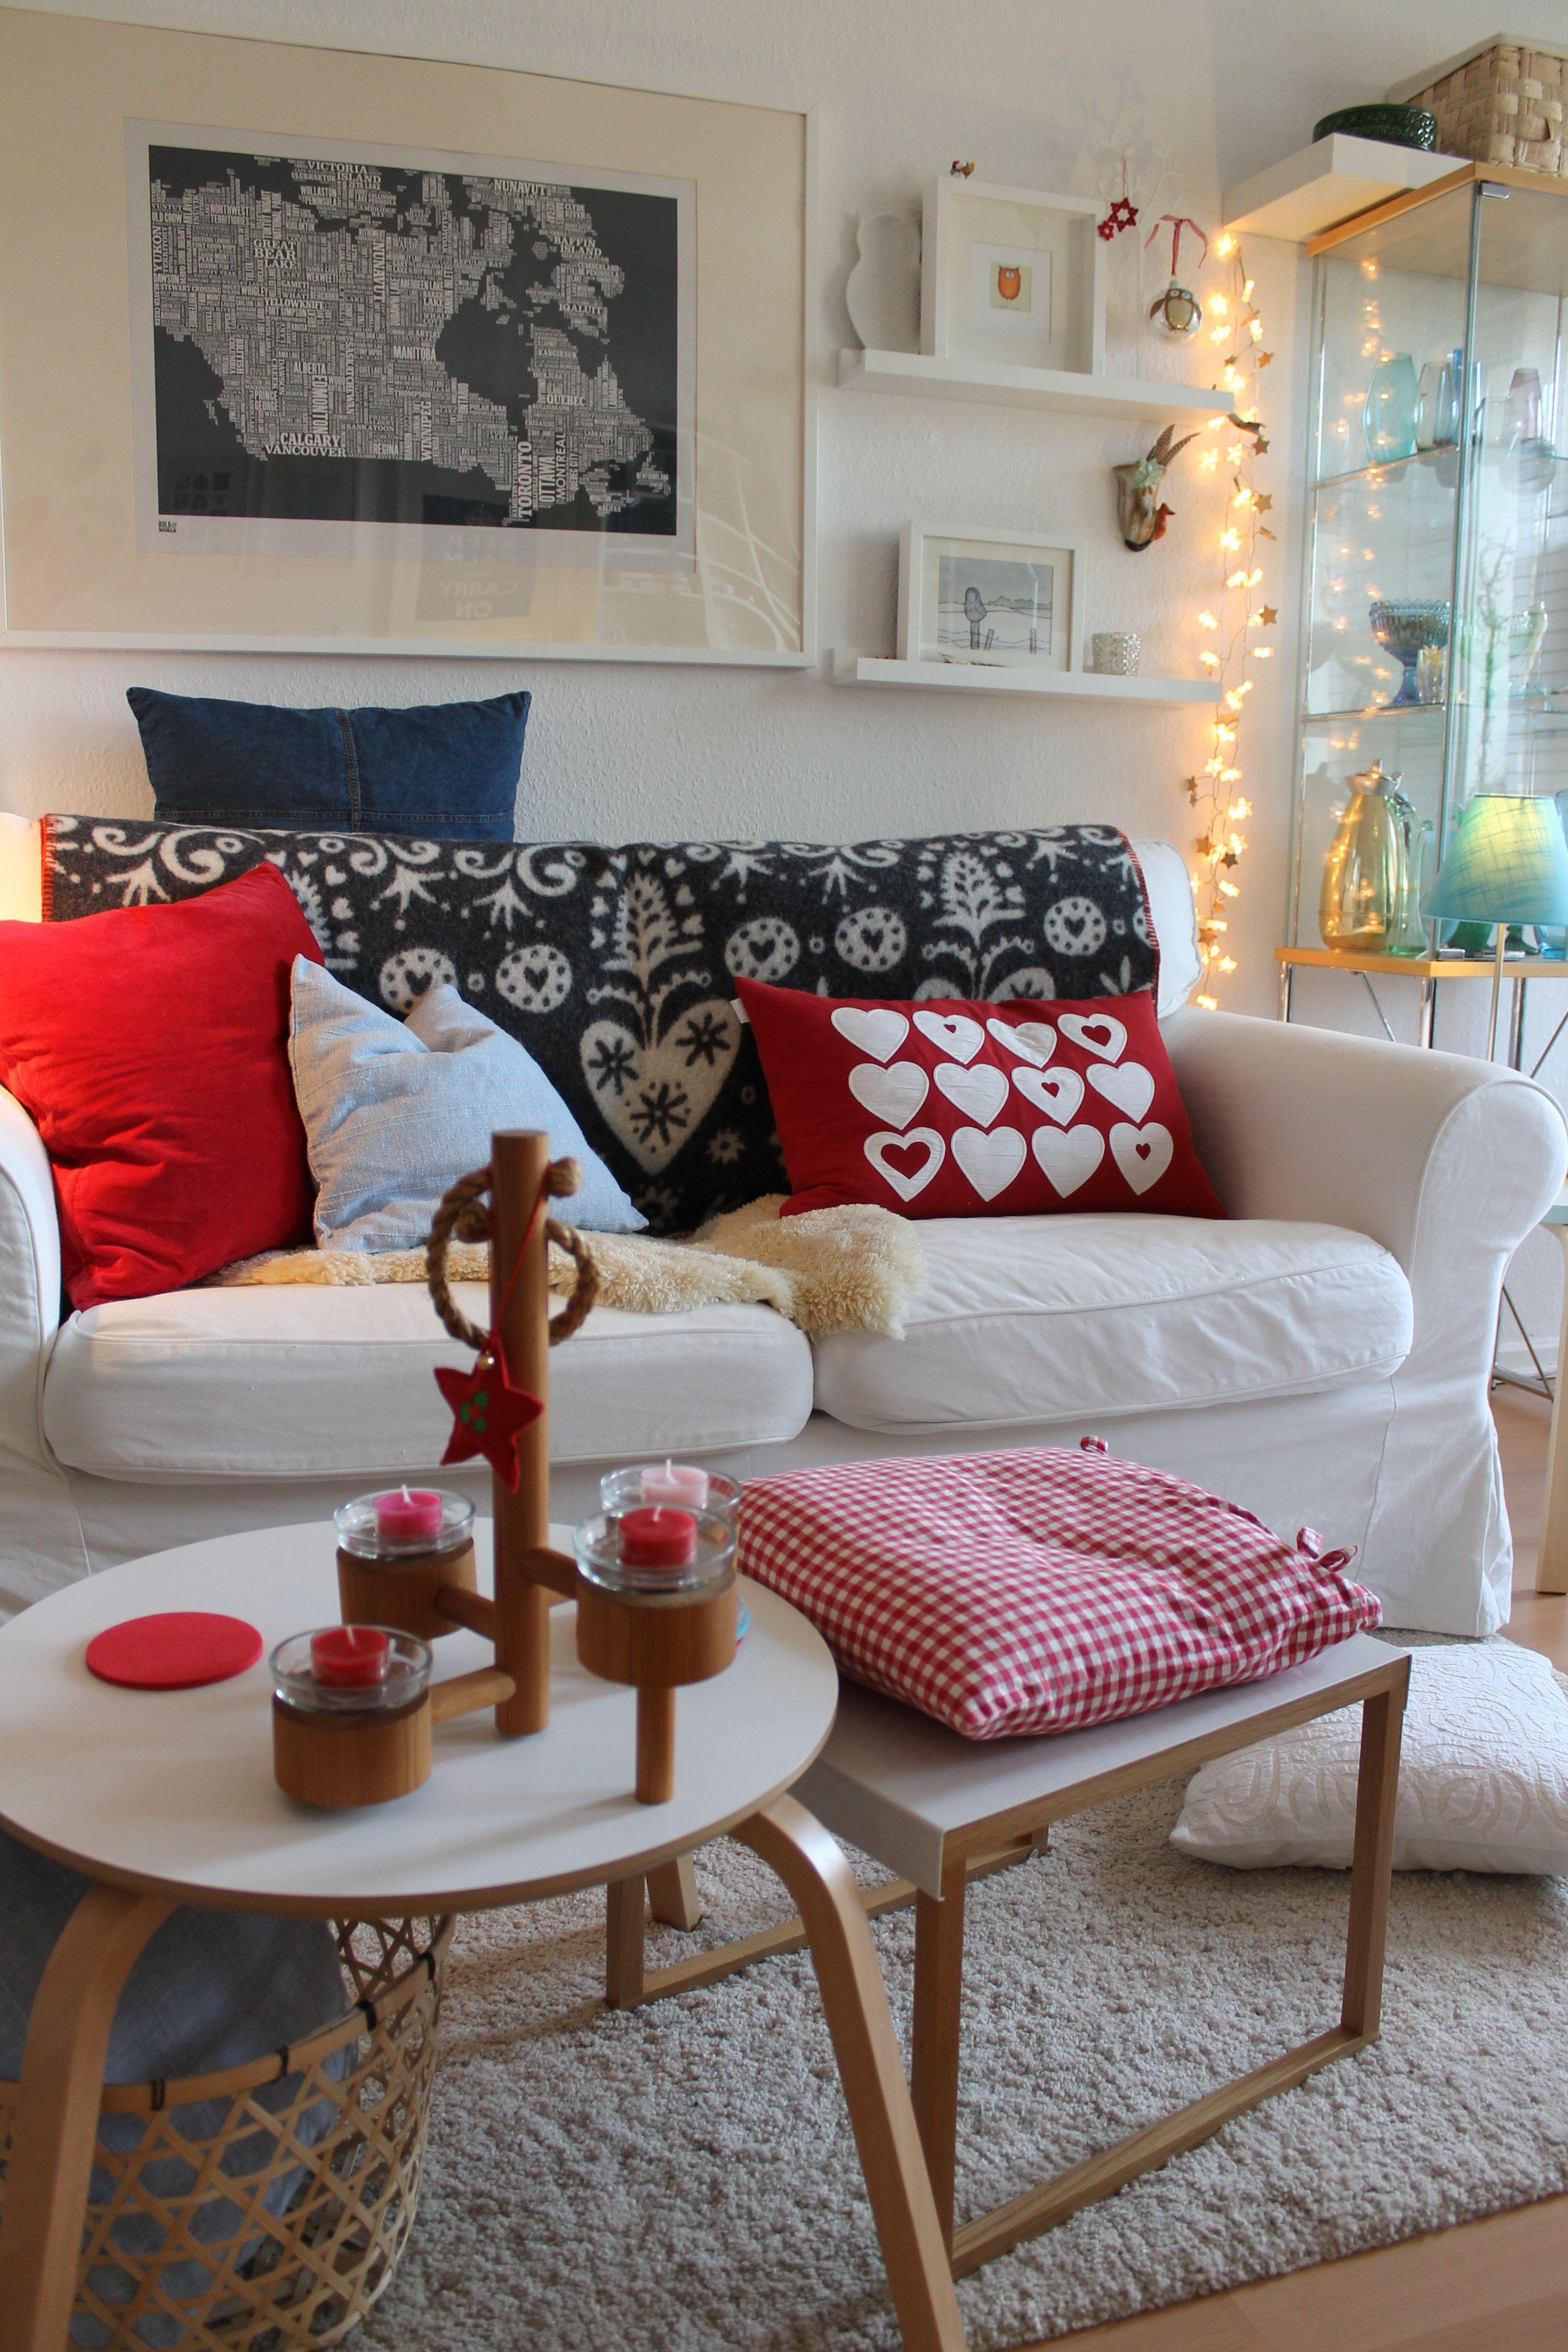 Ektorp Whtite Christmas Time 2014 With Red Grey Shades Of Blue Wood Ikea Habitat Linum Pillow Klippan Blanket Bold Noble Print [ 4272 x 2848 Pixel ]